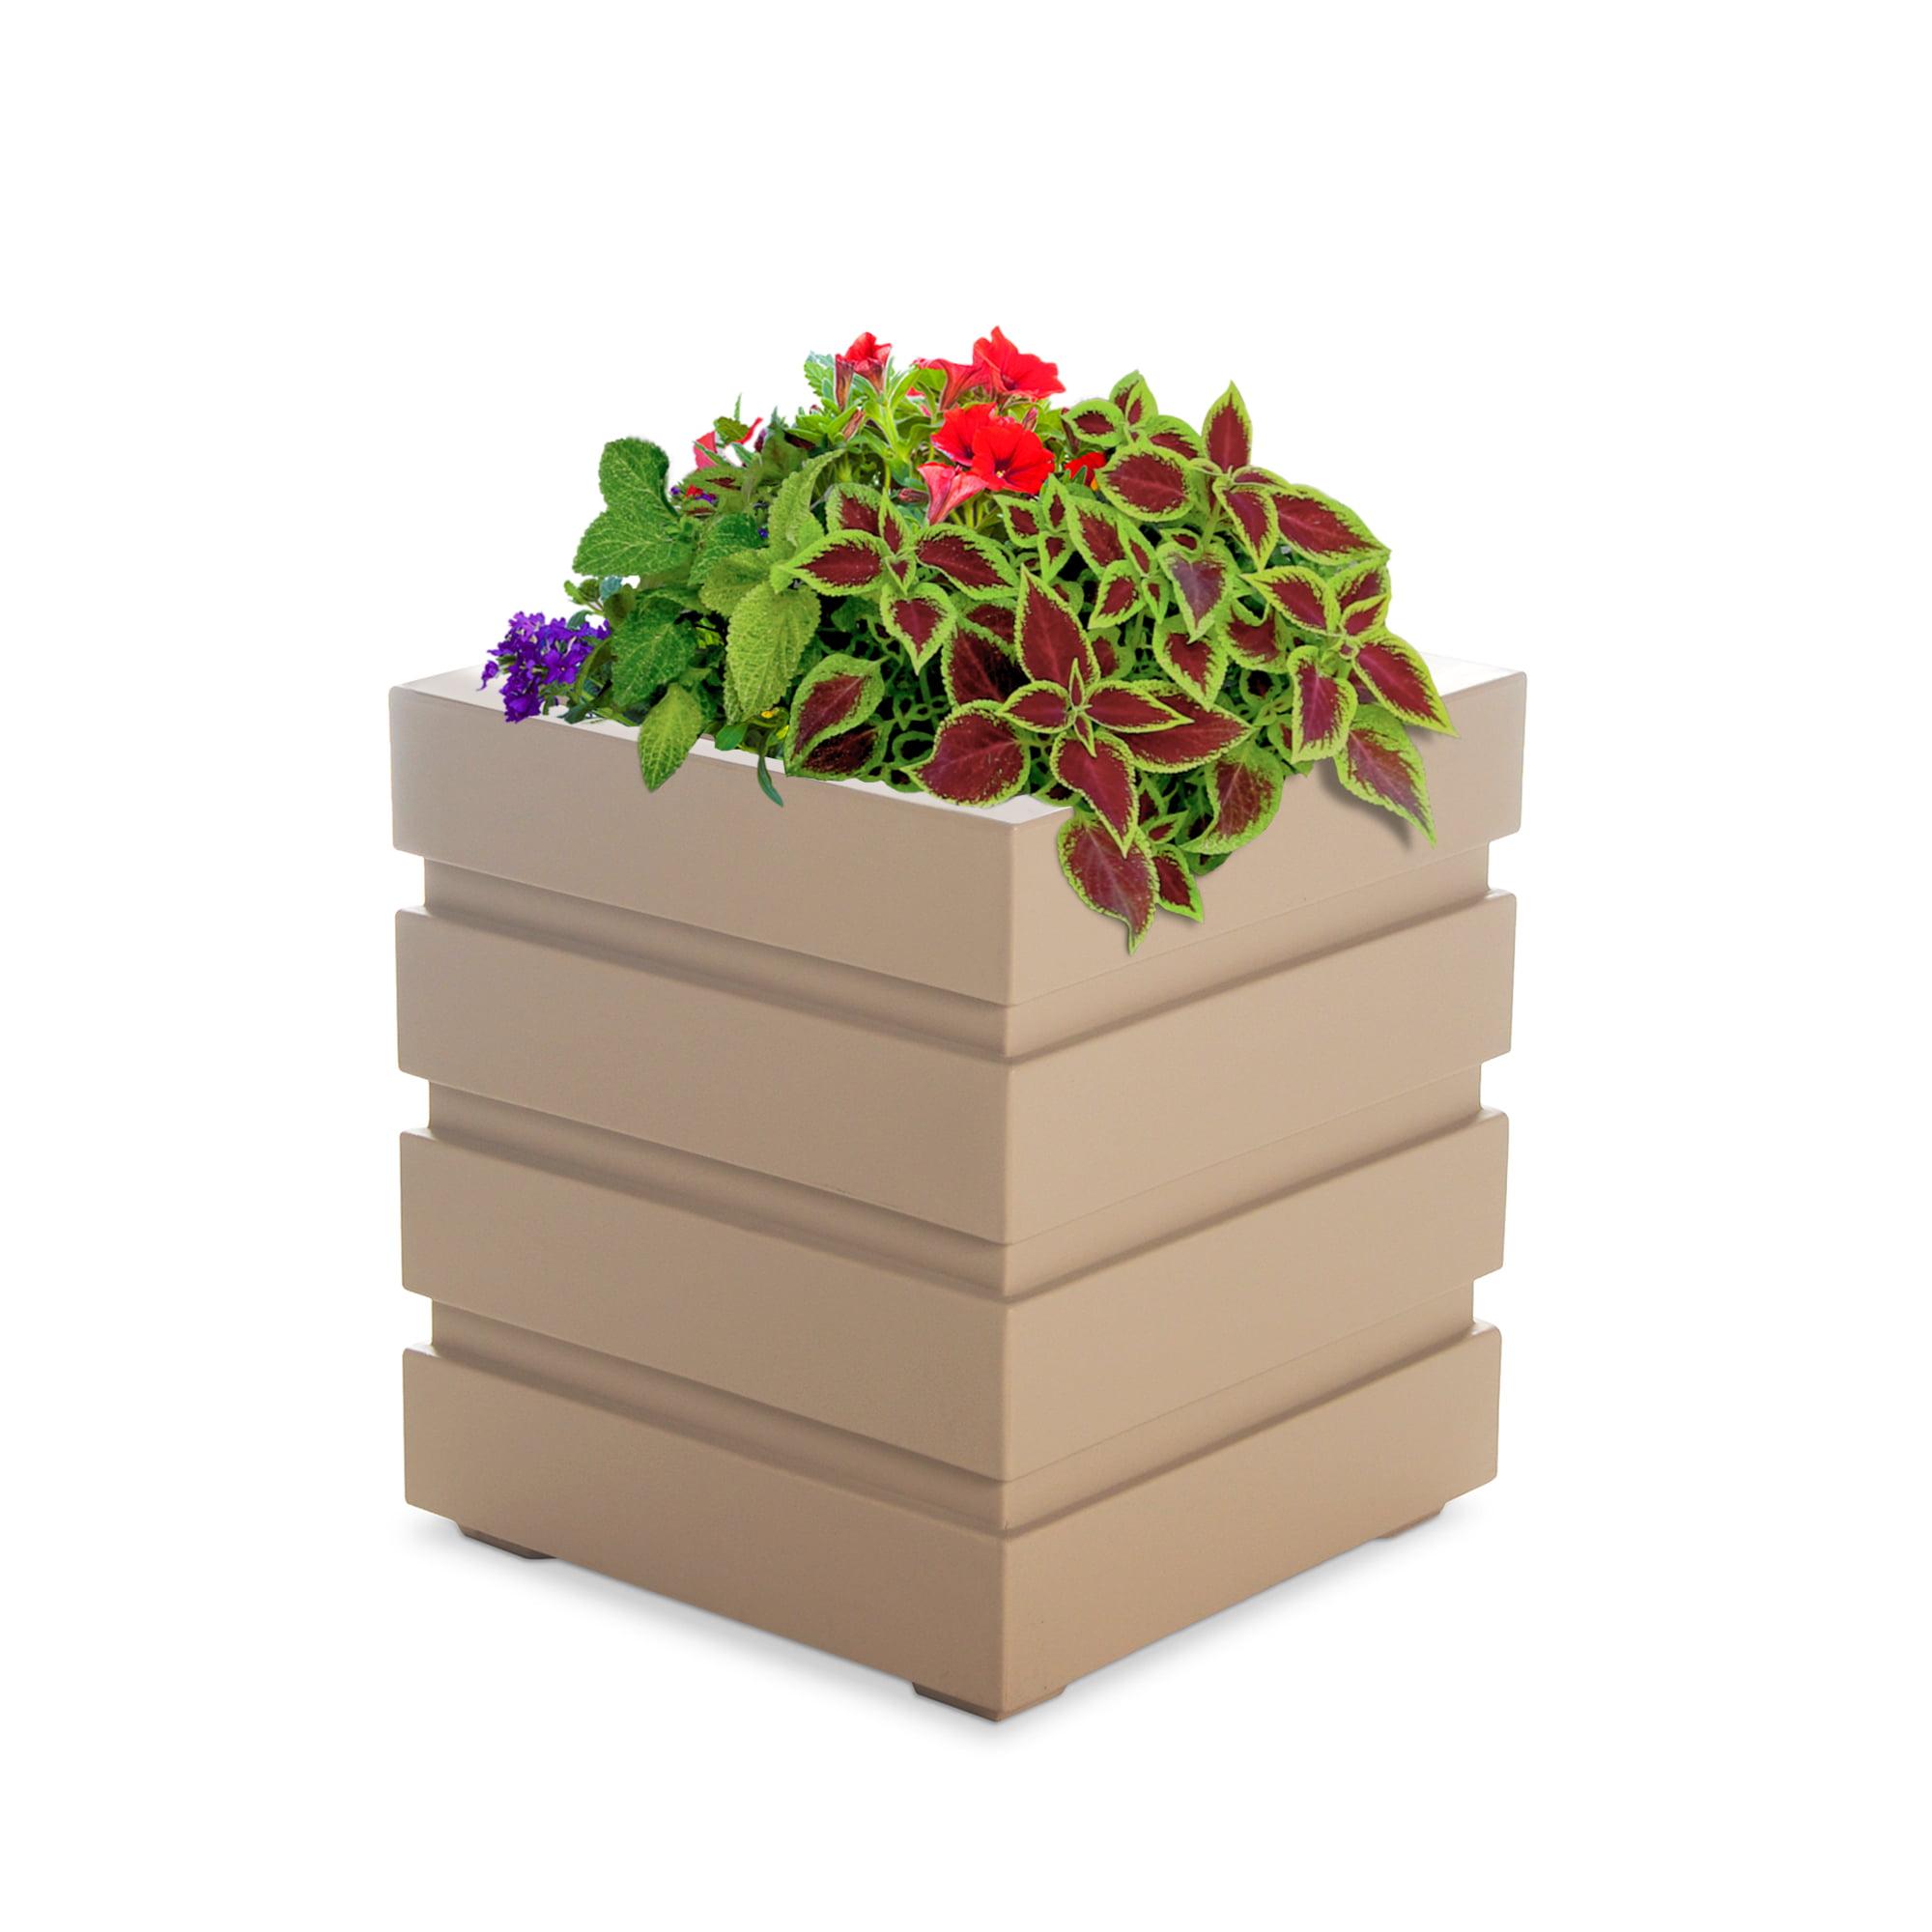 Freeport Patio Planter 18x18 - Clay